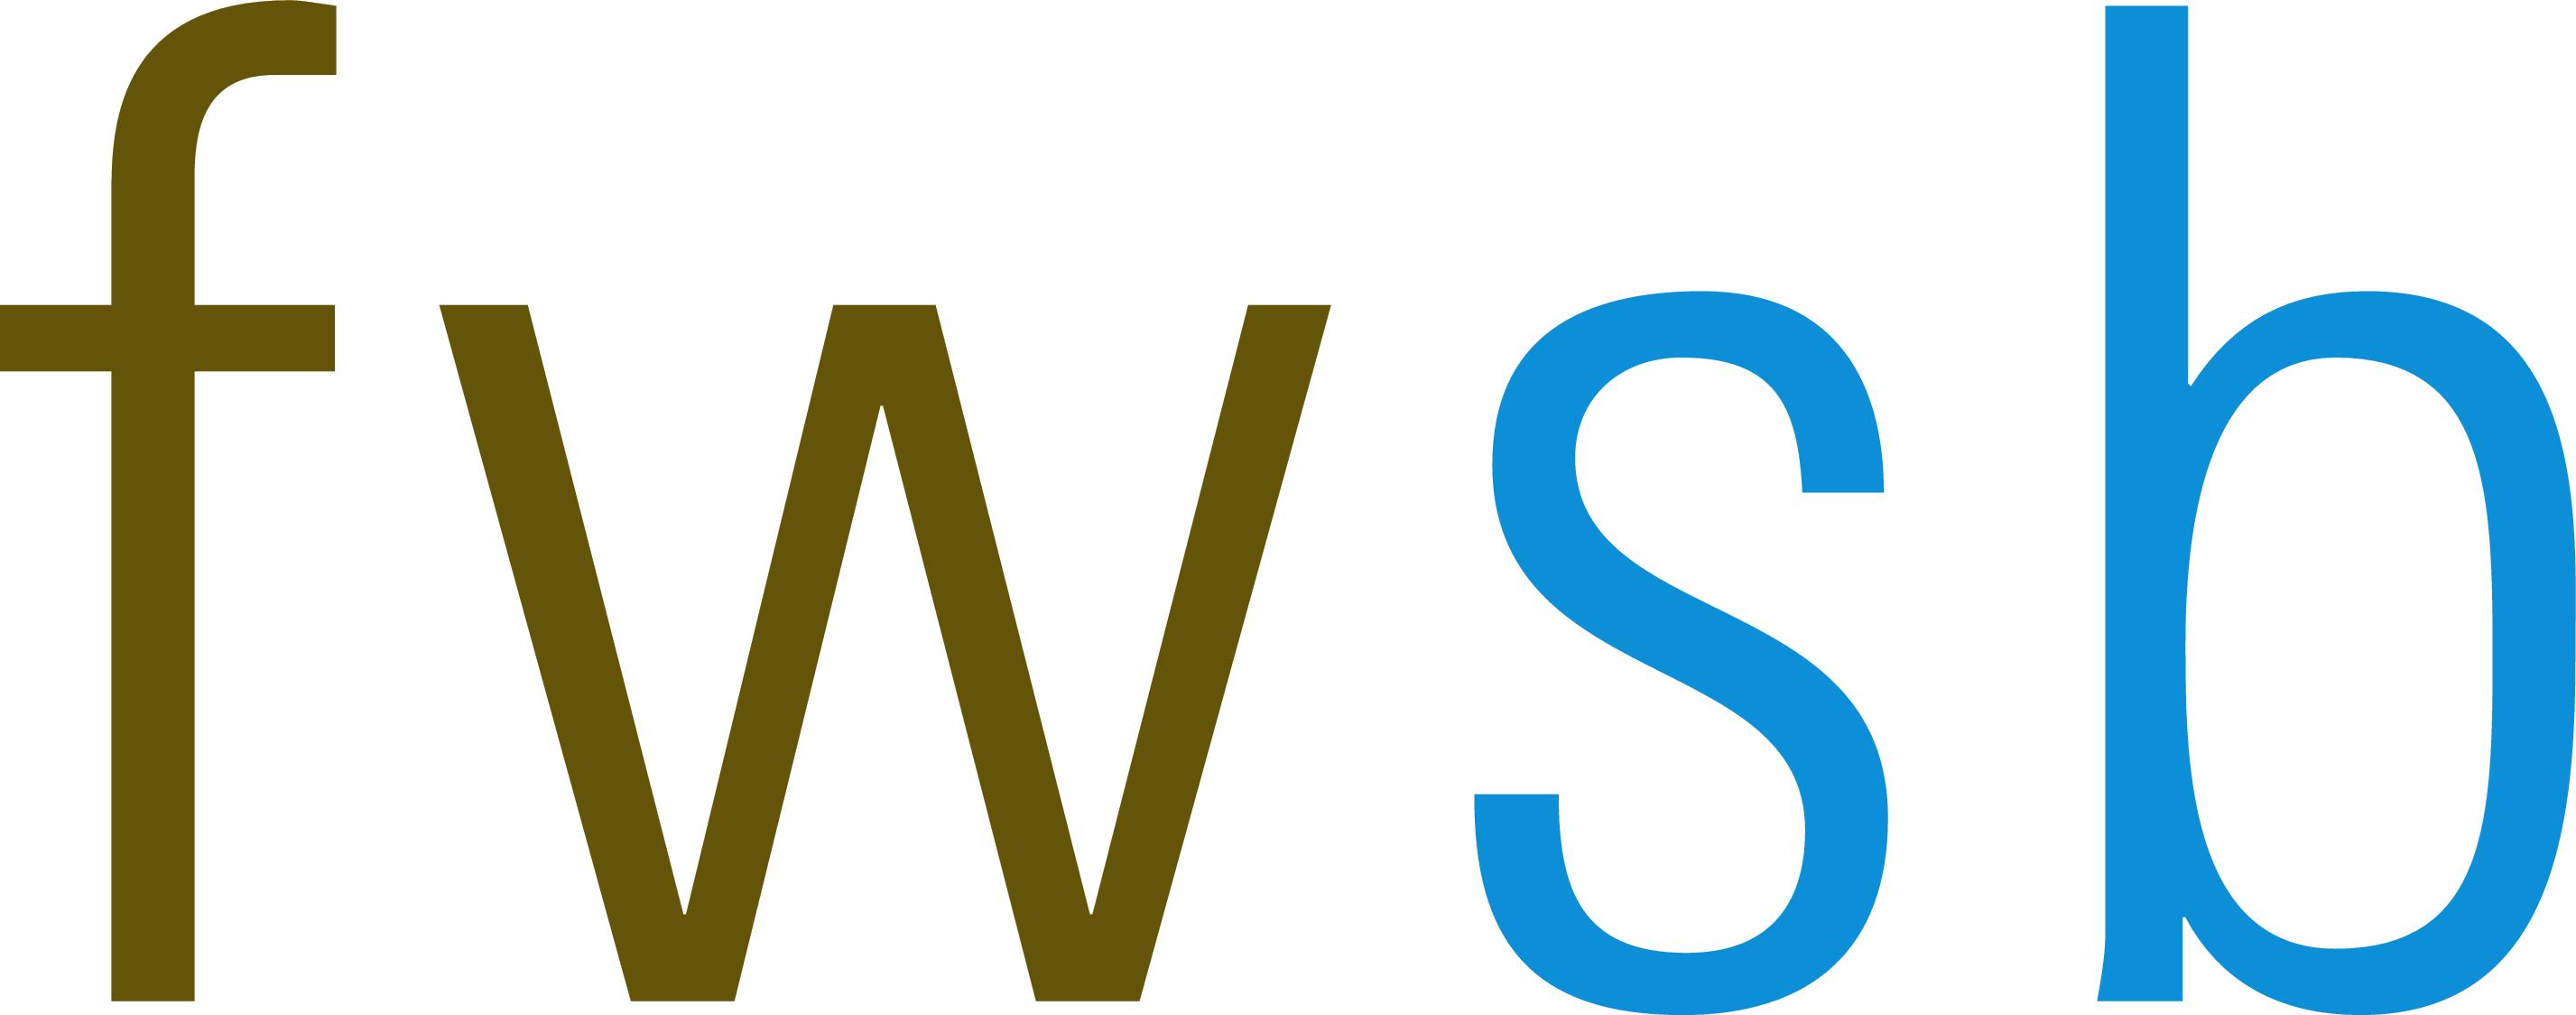 fwsb Logo